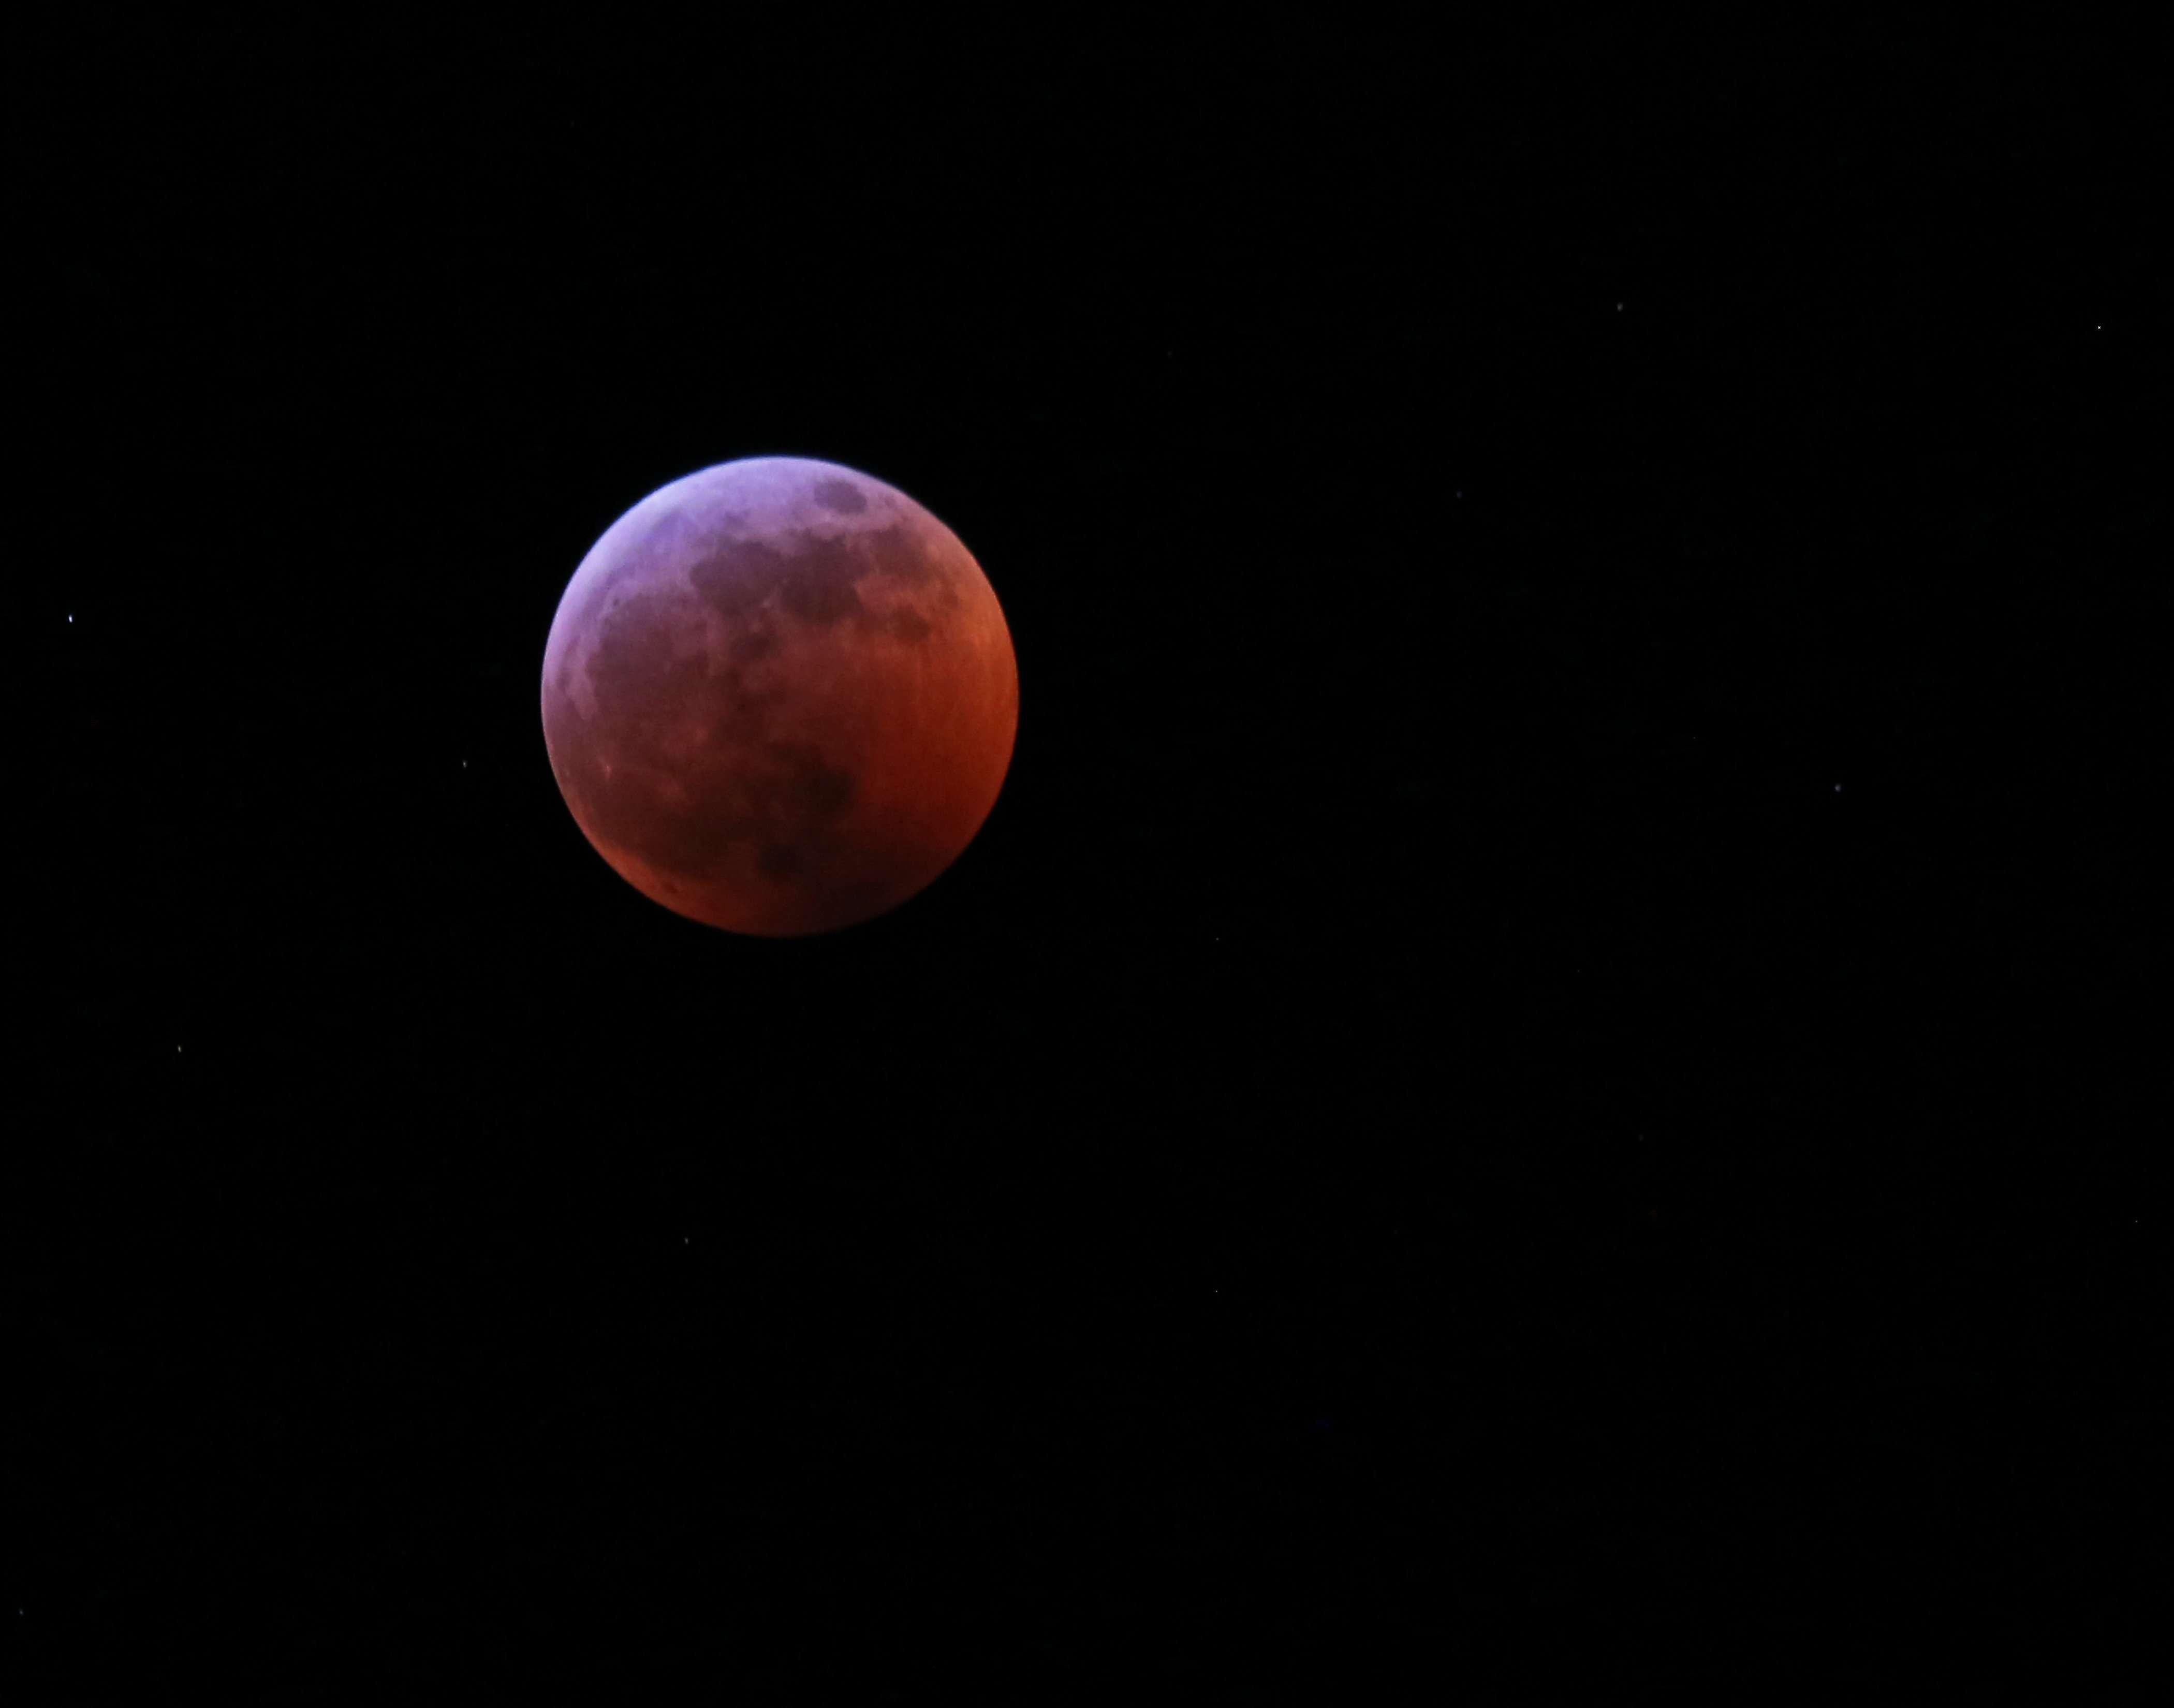 Super Moon Blood Moon Wolf Moon photo by Gail E Rowley Ozark Stream Photography